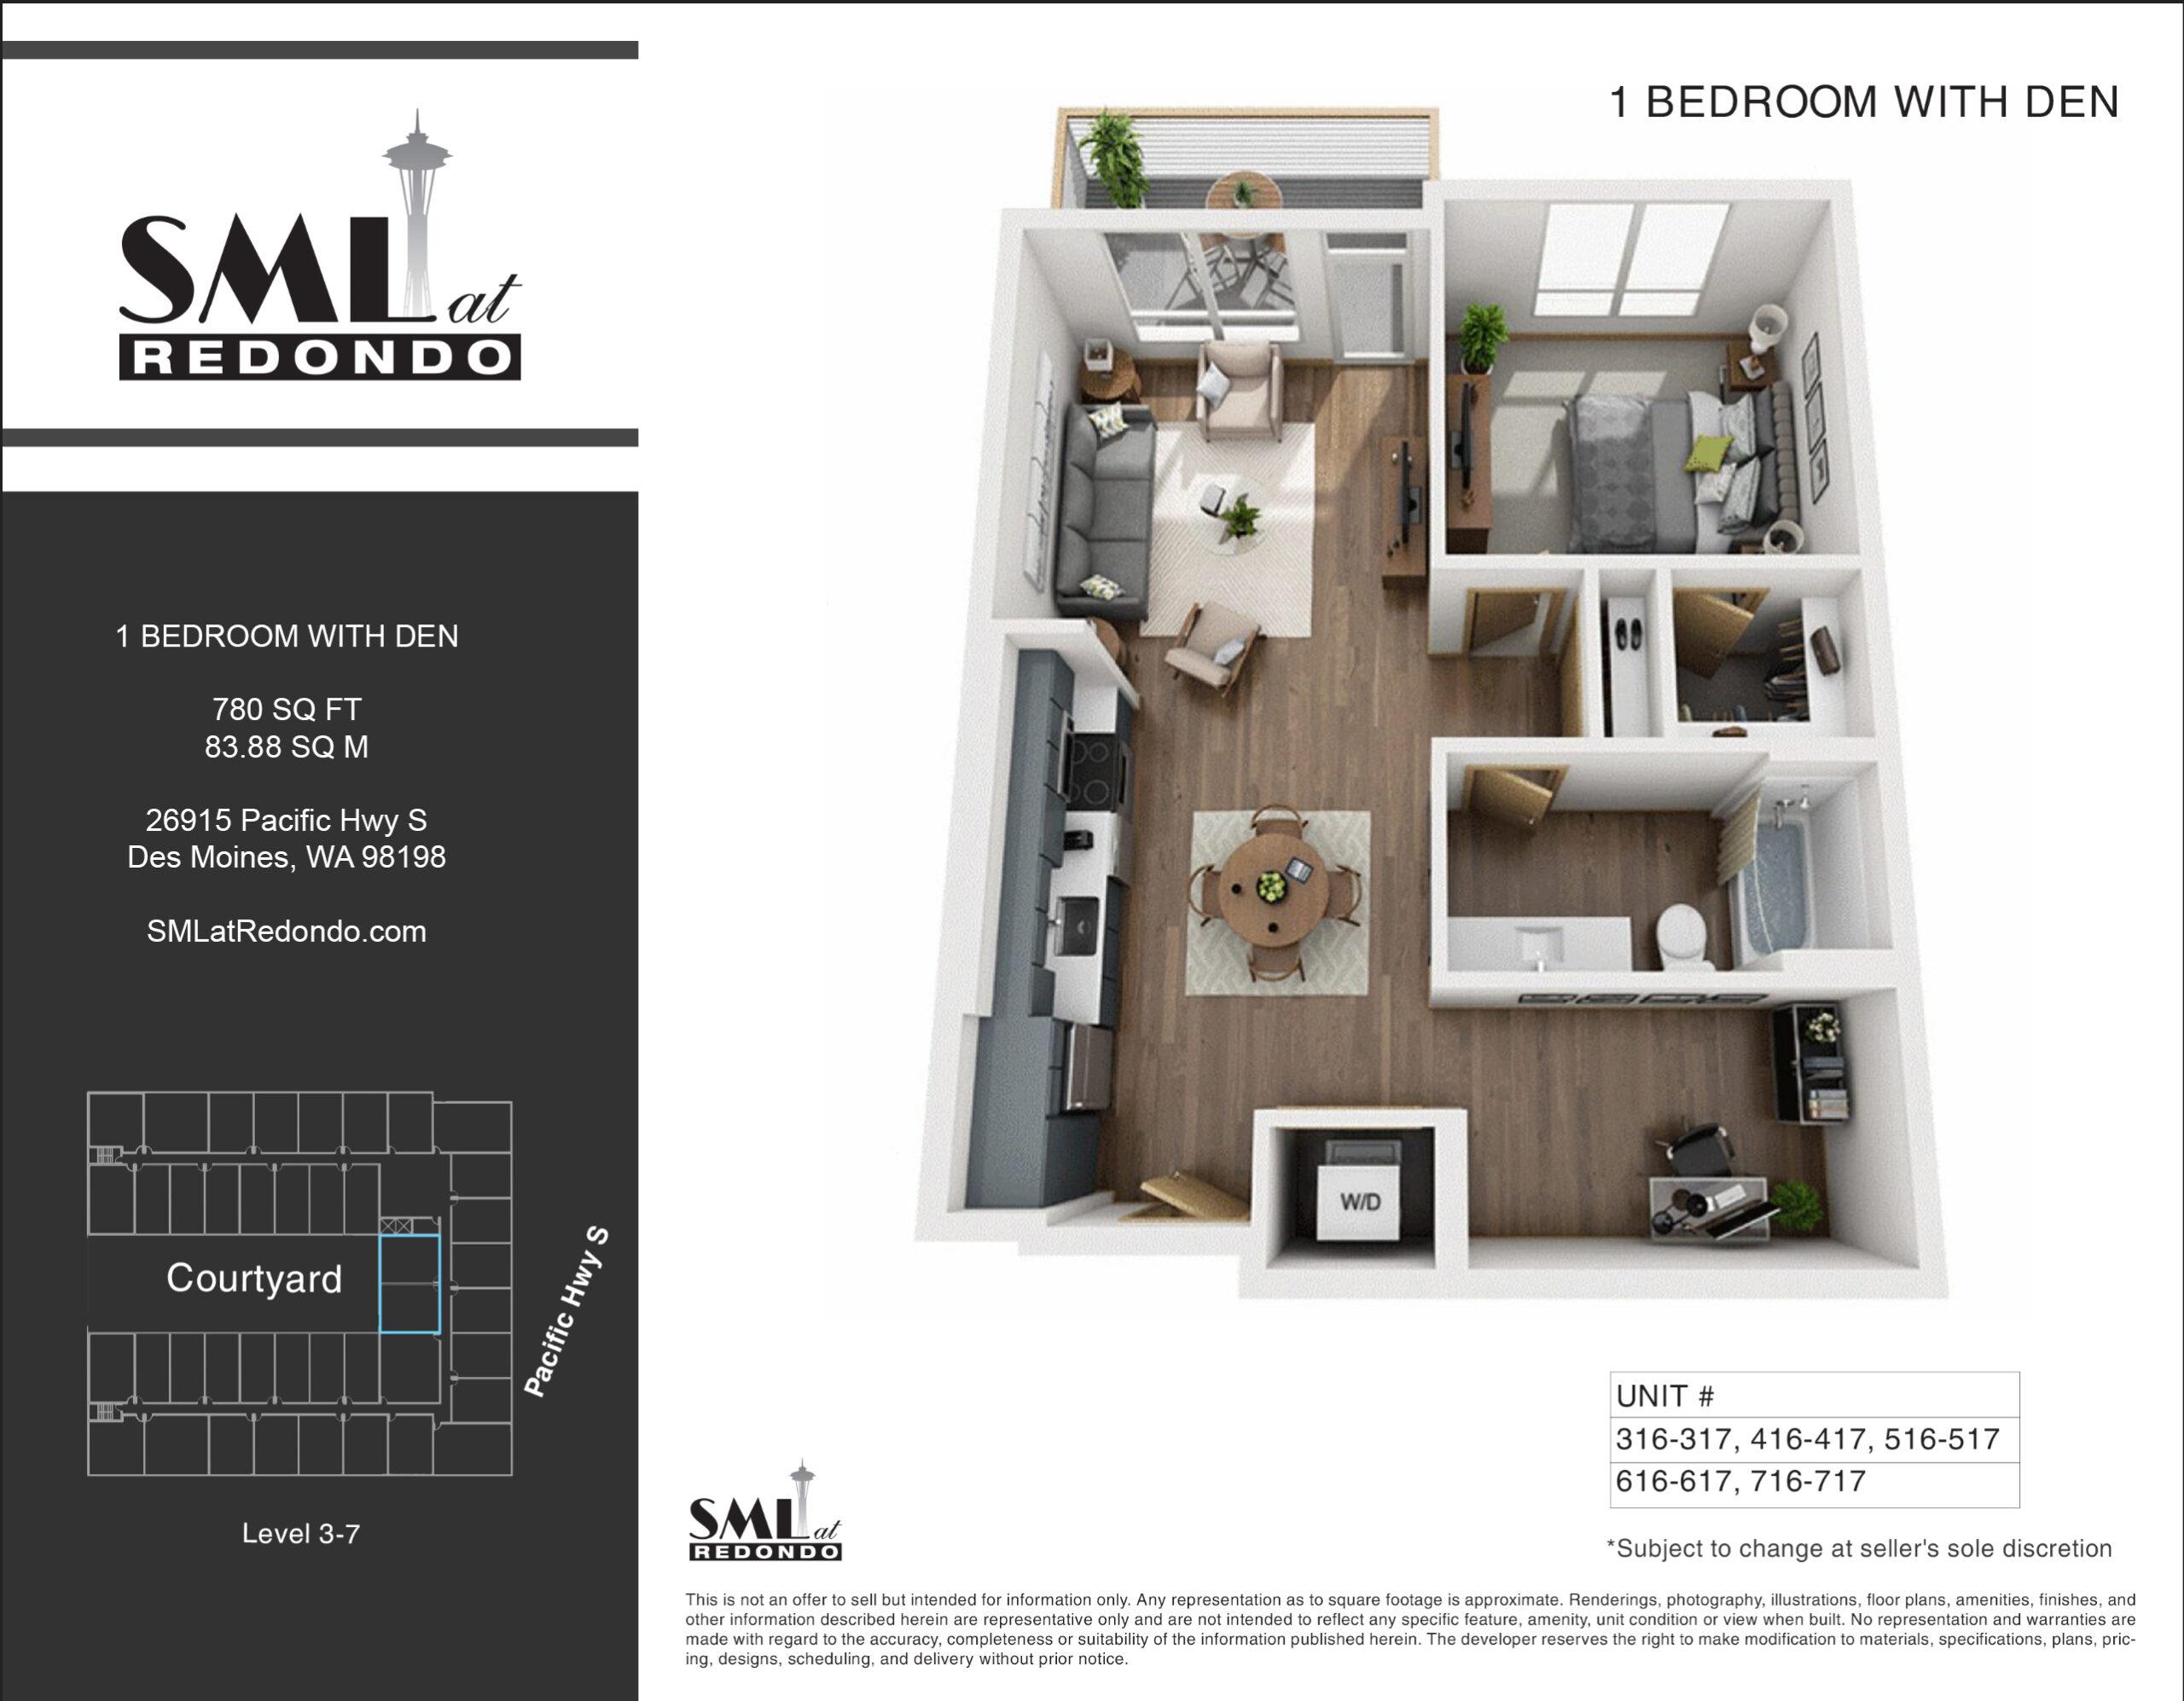 SML Redondo 1 Bedroom with Den